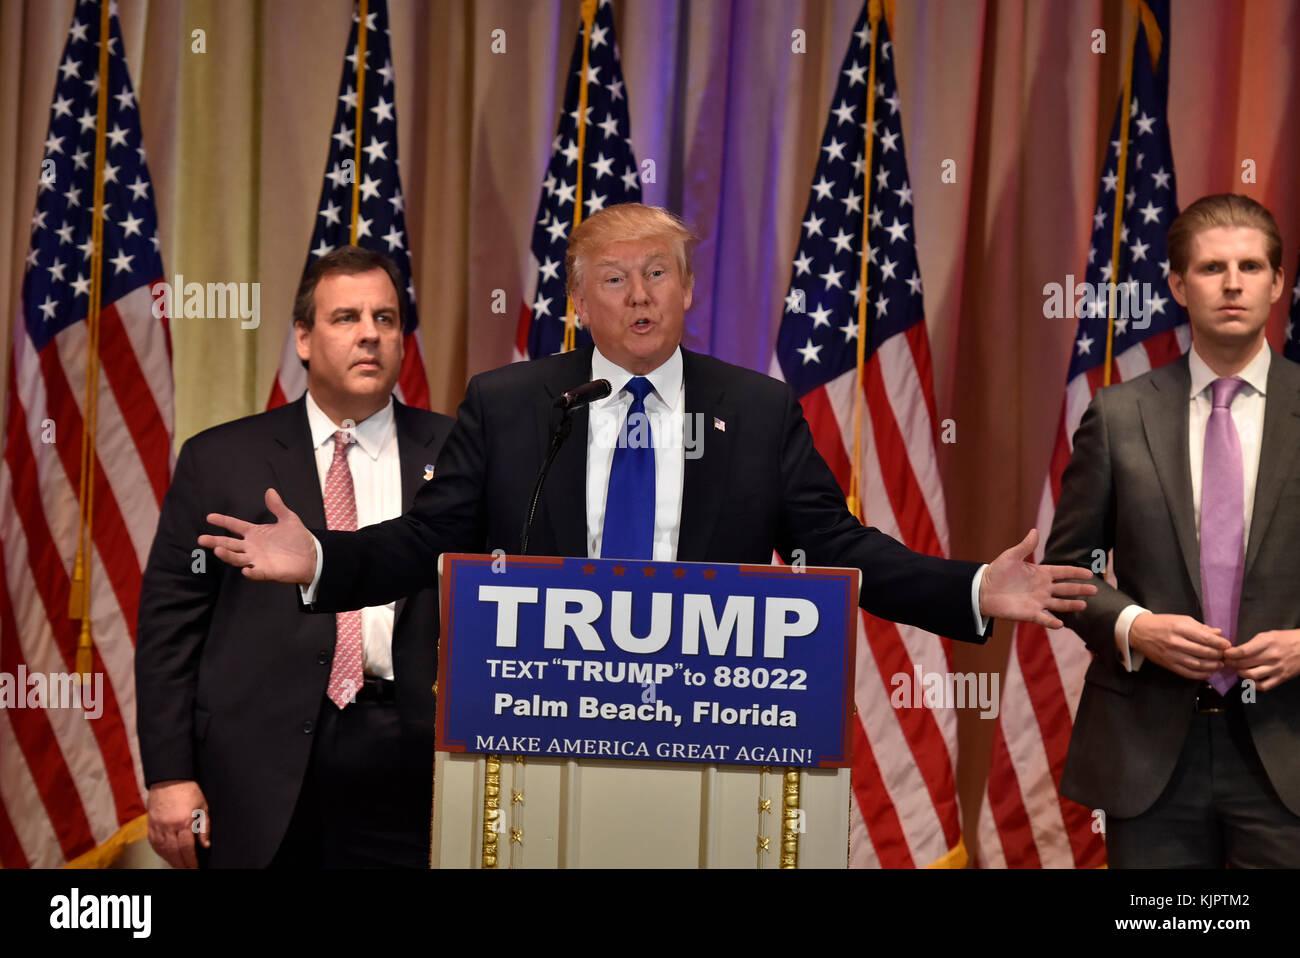 palm beach fl march 01 republican presidential frontrunner